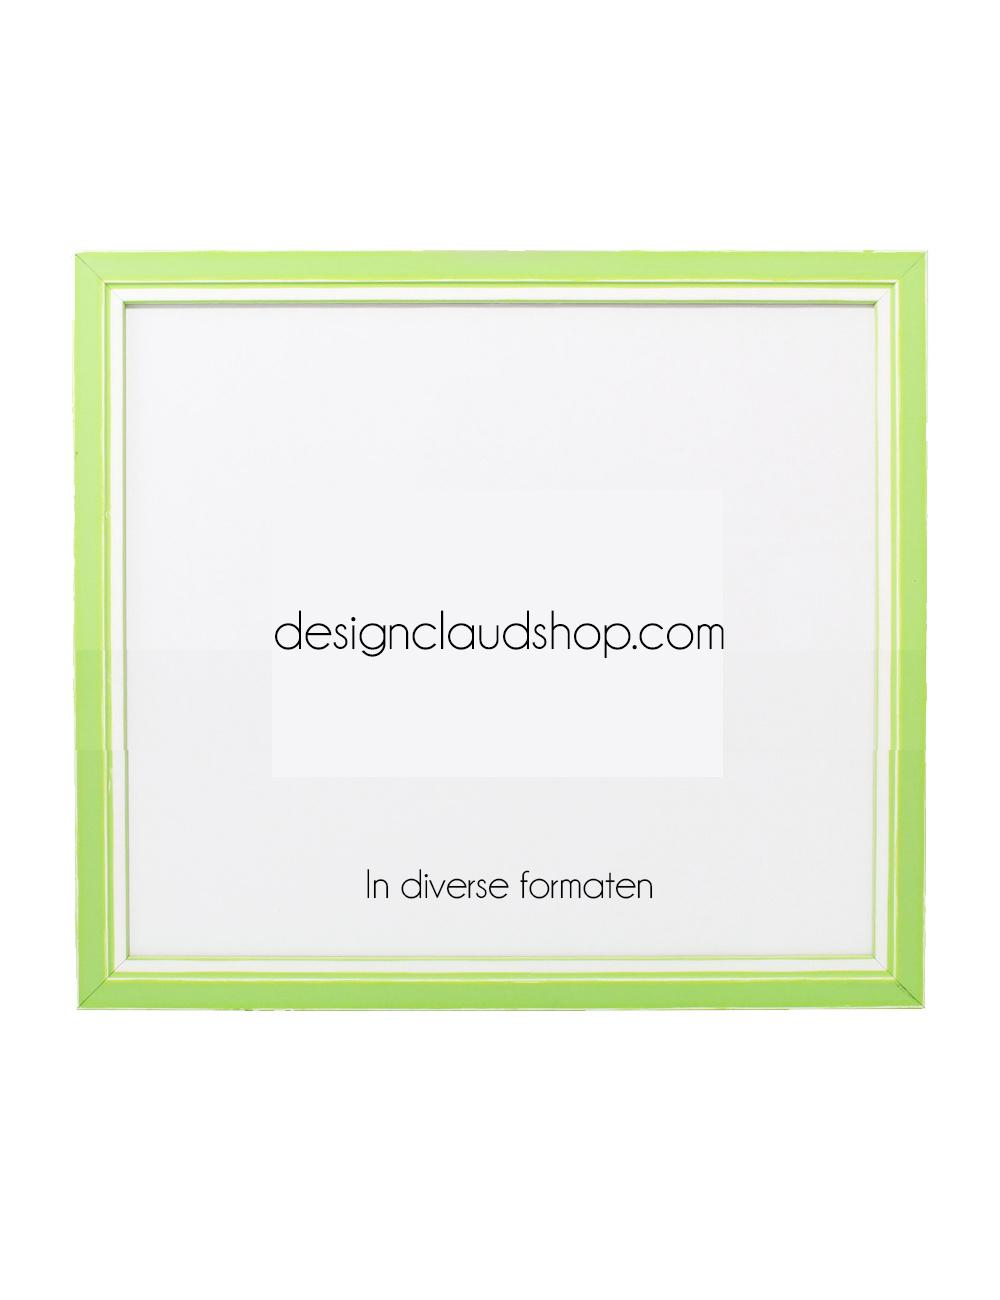 Witte Houten Fotolijst.Houten Wissellijst Groen Wit Fotolijst Met Glas 3d Effect